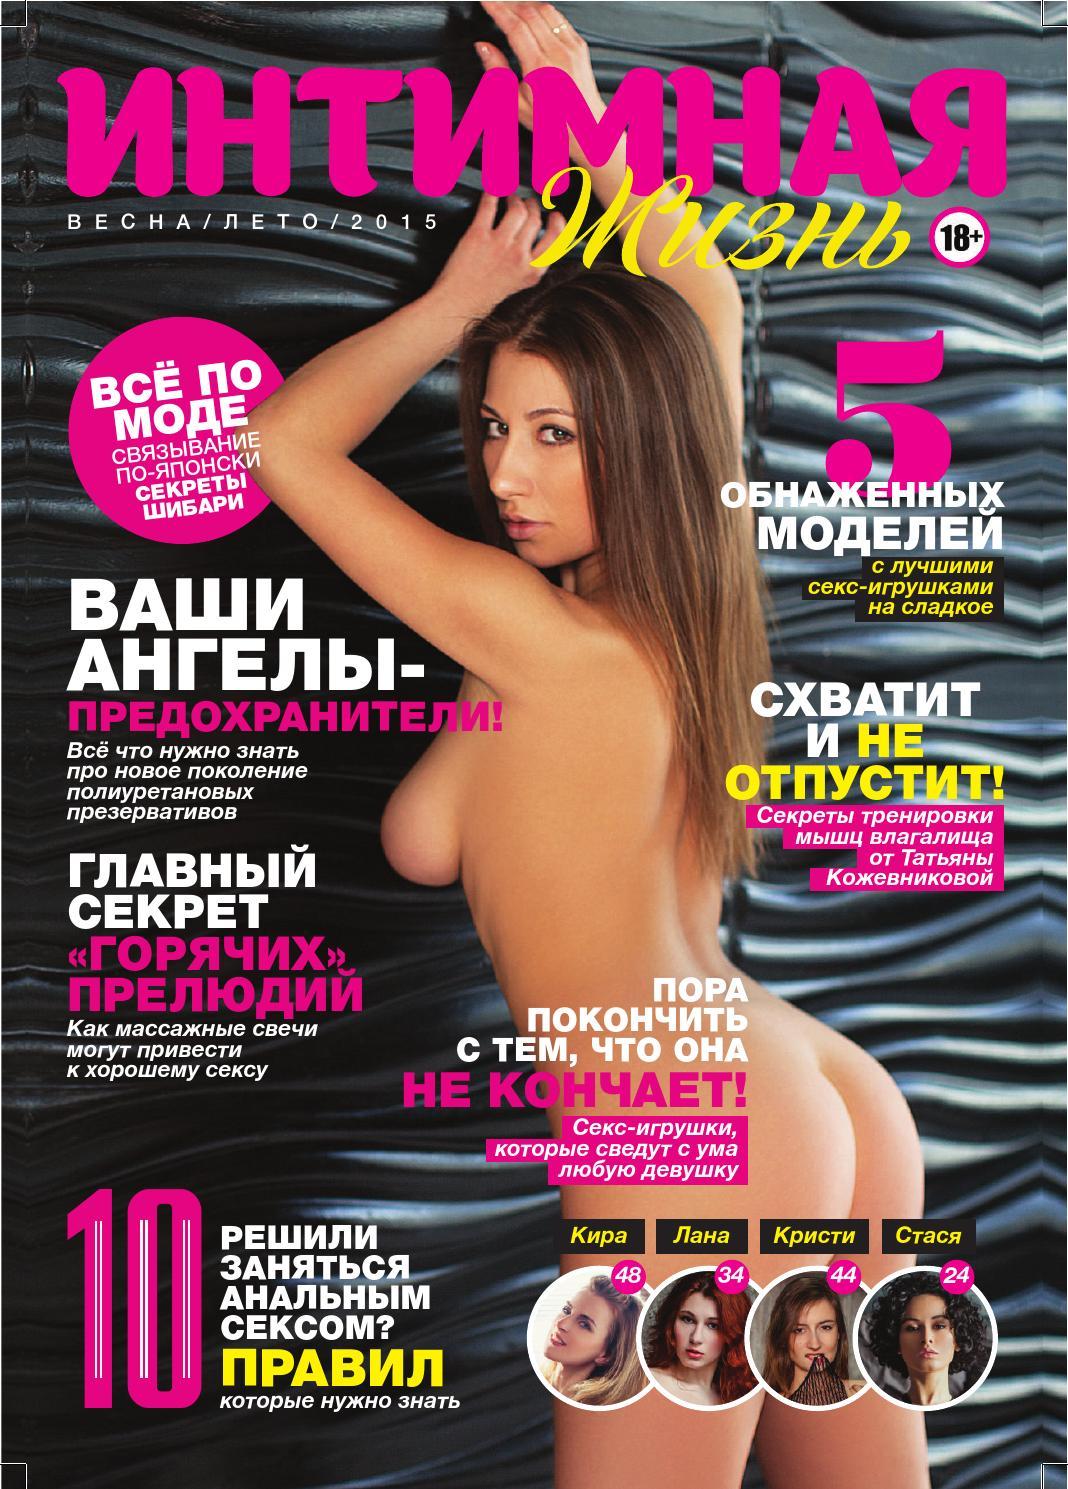 Эротический журнал онлайн — photo 2